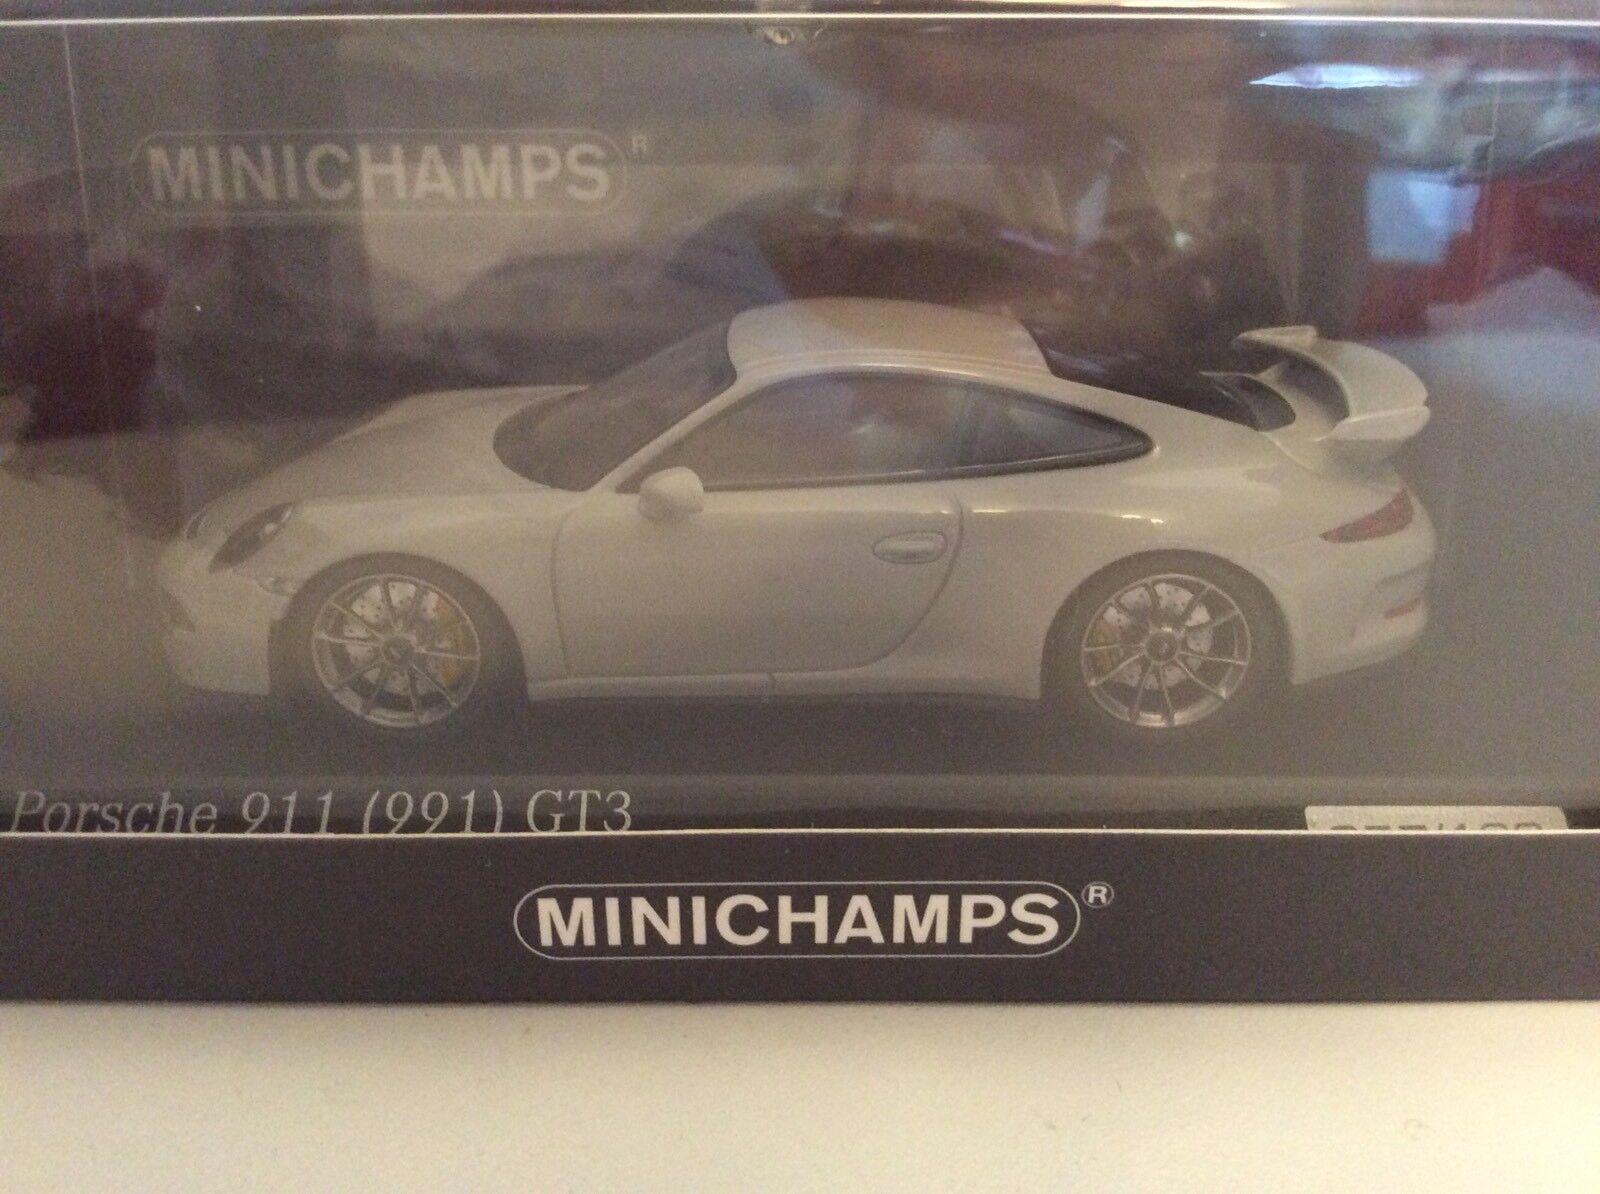 Minichamps 1 43 PORSCHE 911 991 gt3 FASHION gris cartima solo 100 pezzi nuovo OVP